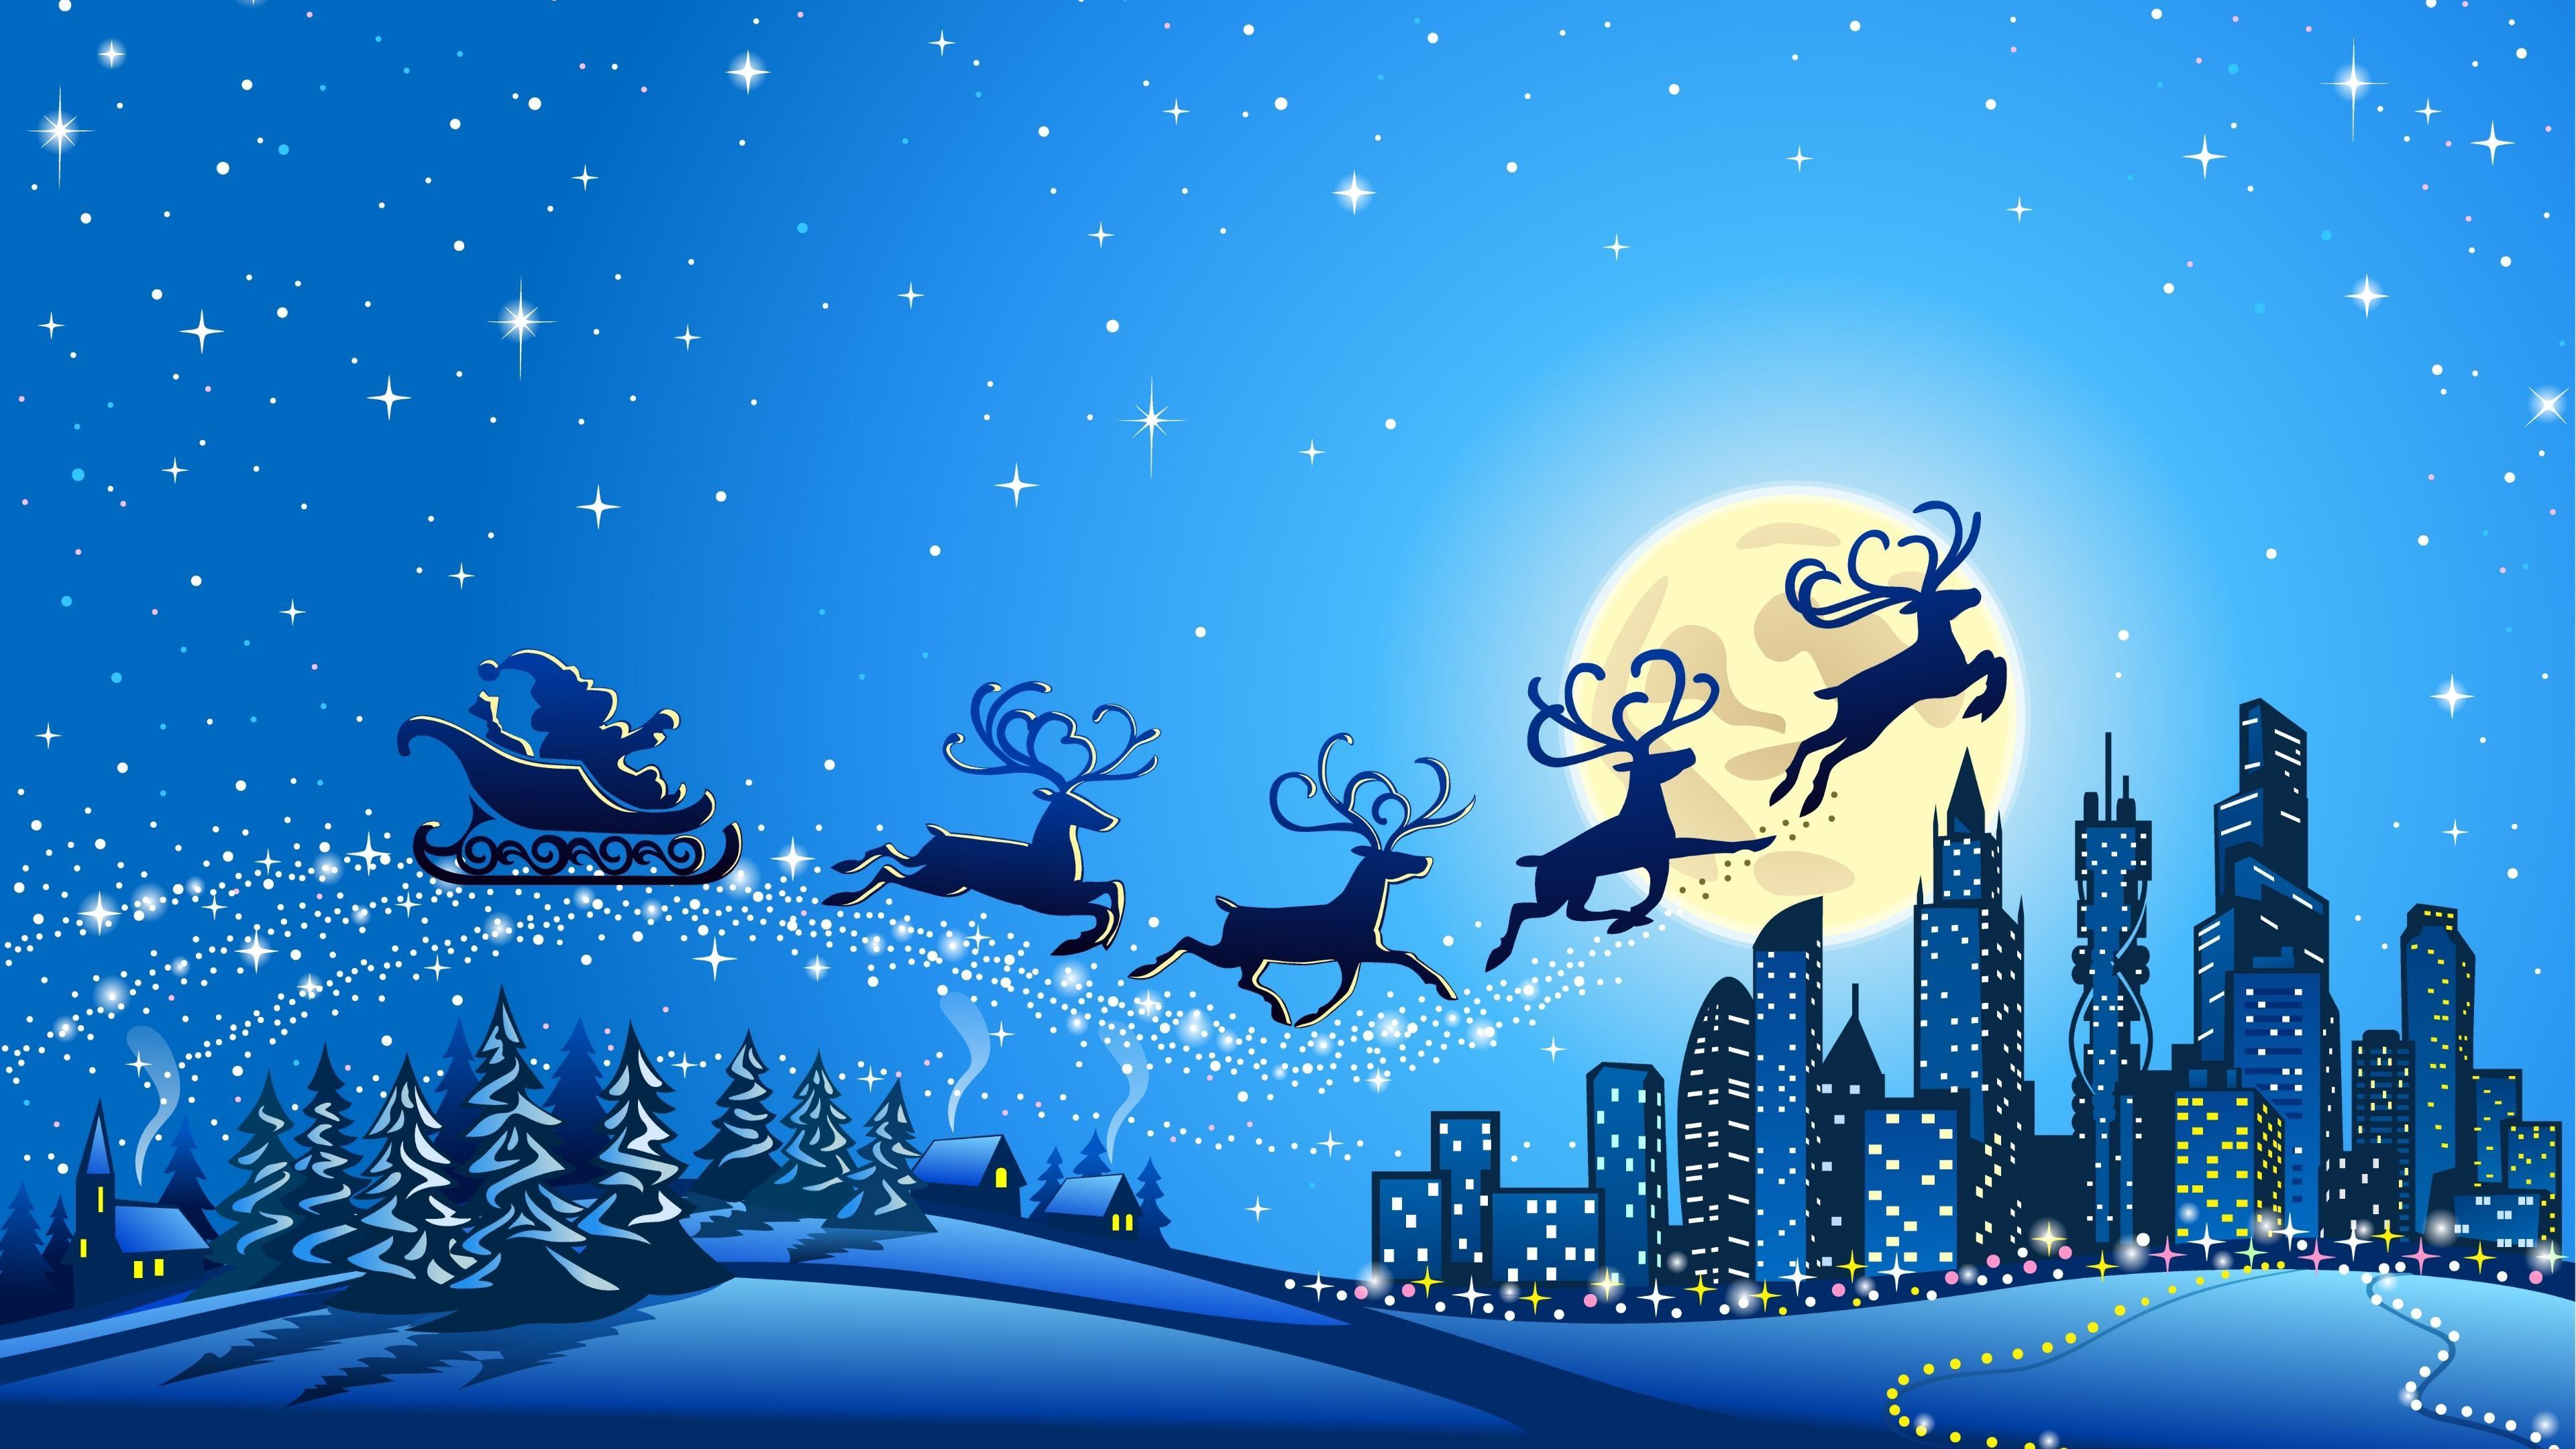 1920x1200 Cute Santa Claus Wallpaper Christmas Tree